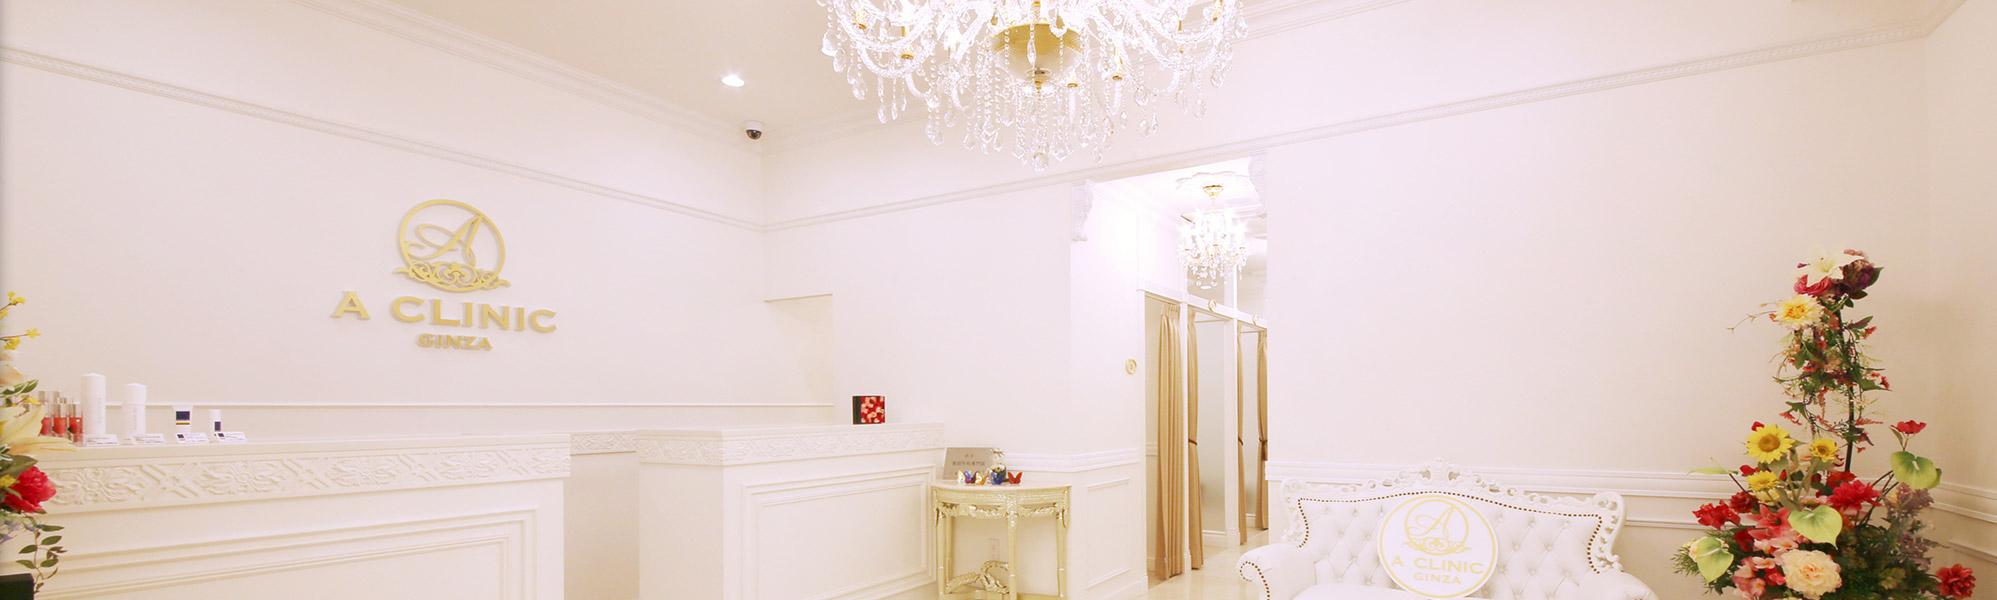 A CLINIC銀座院